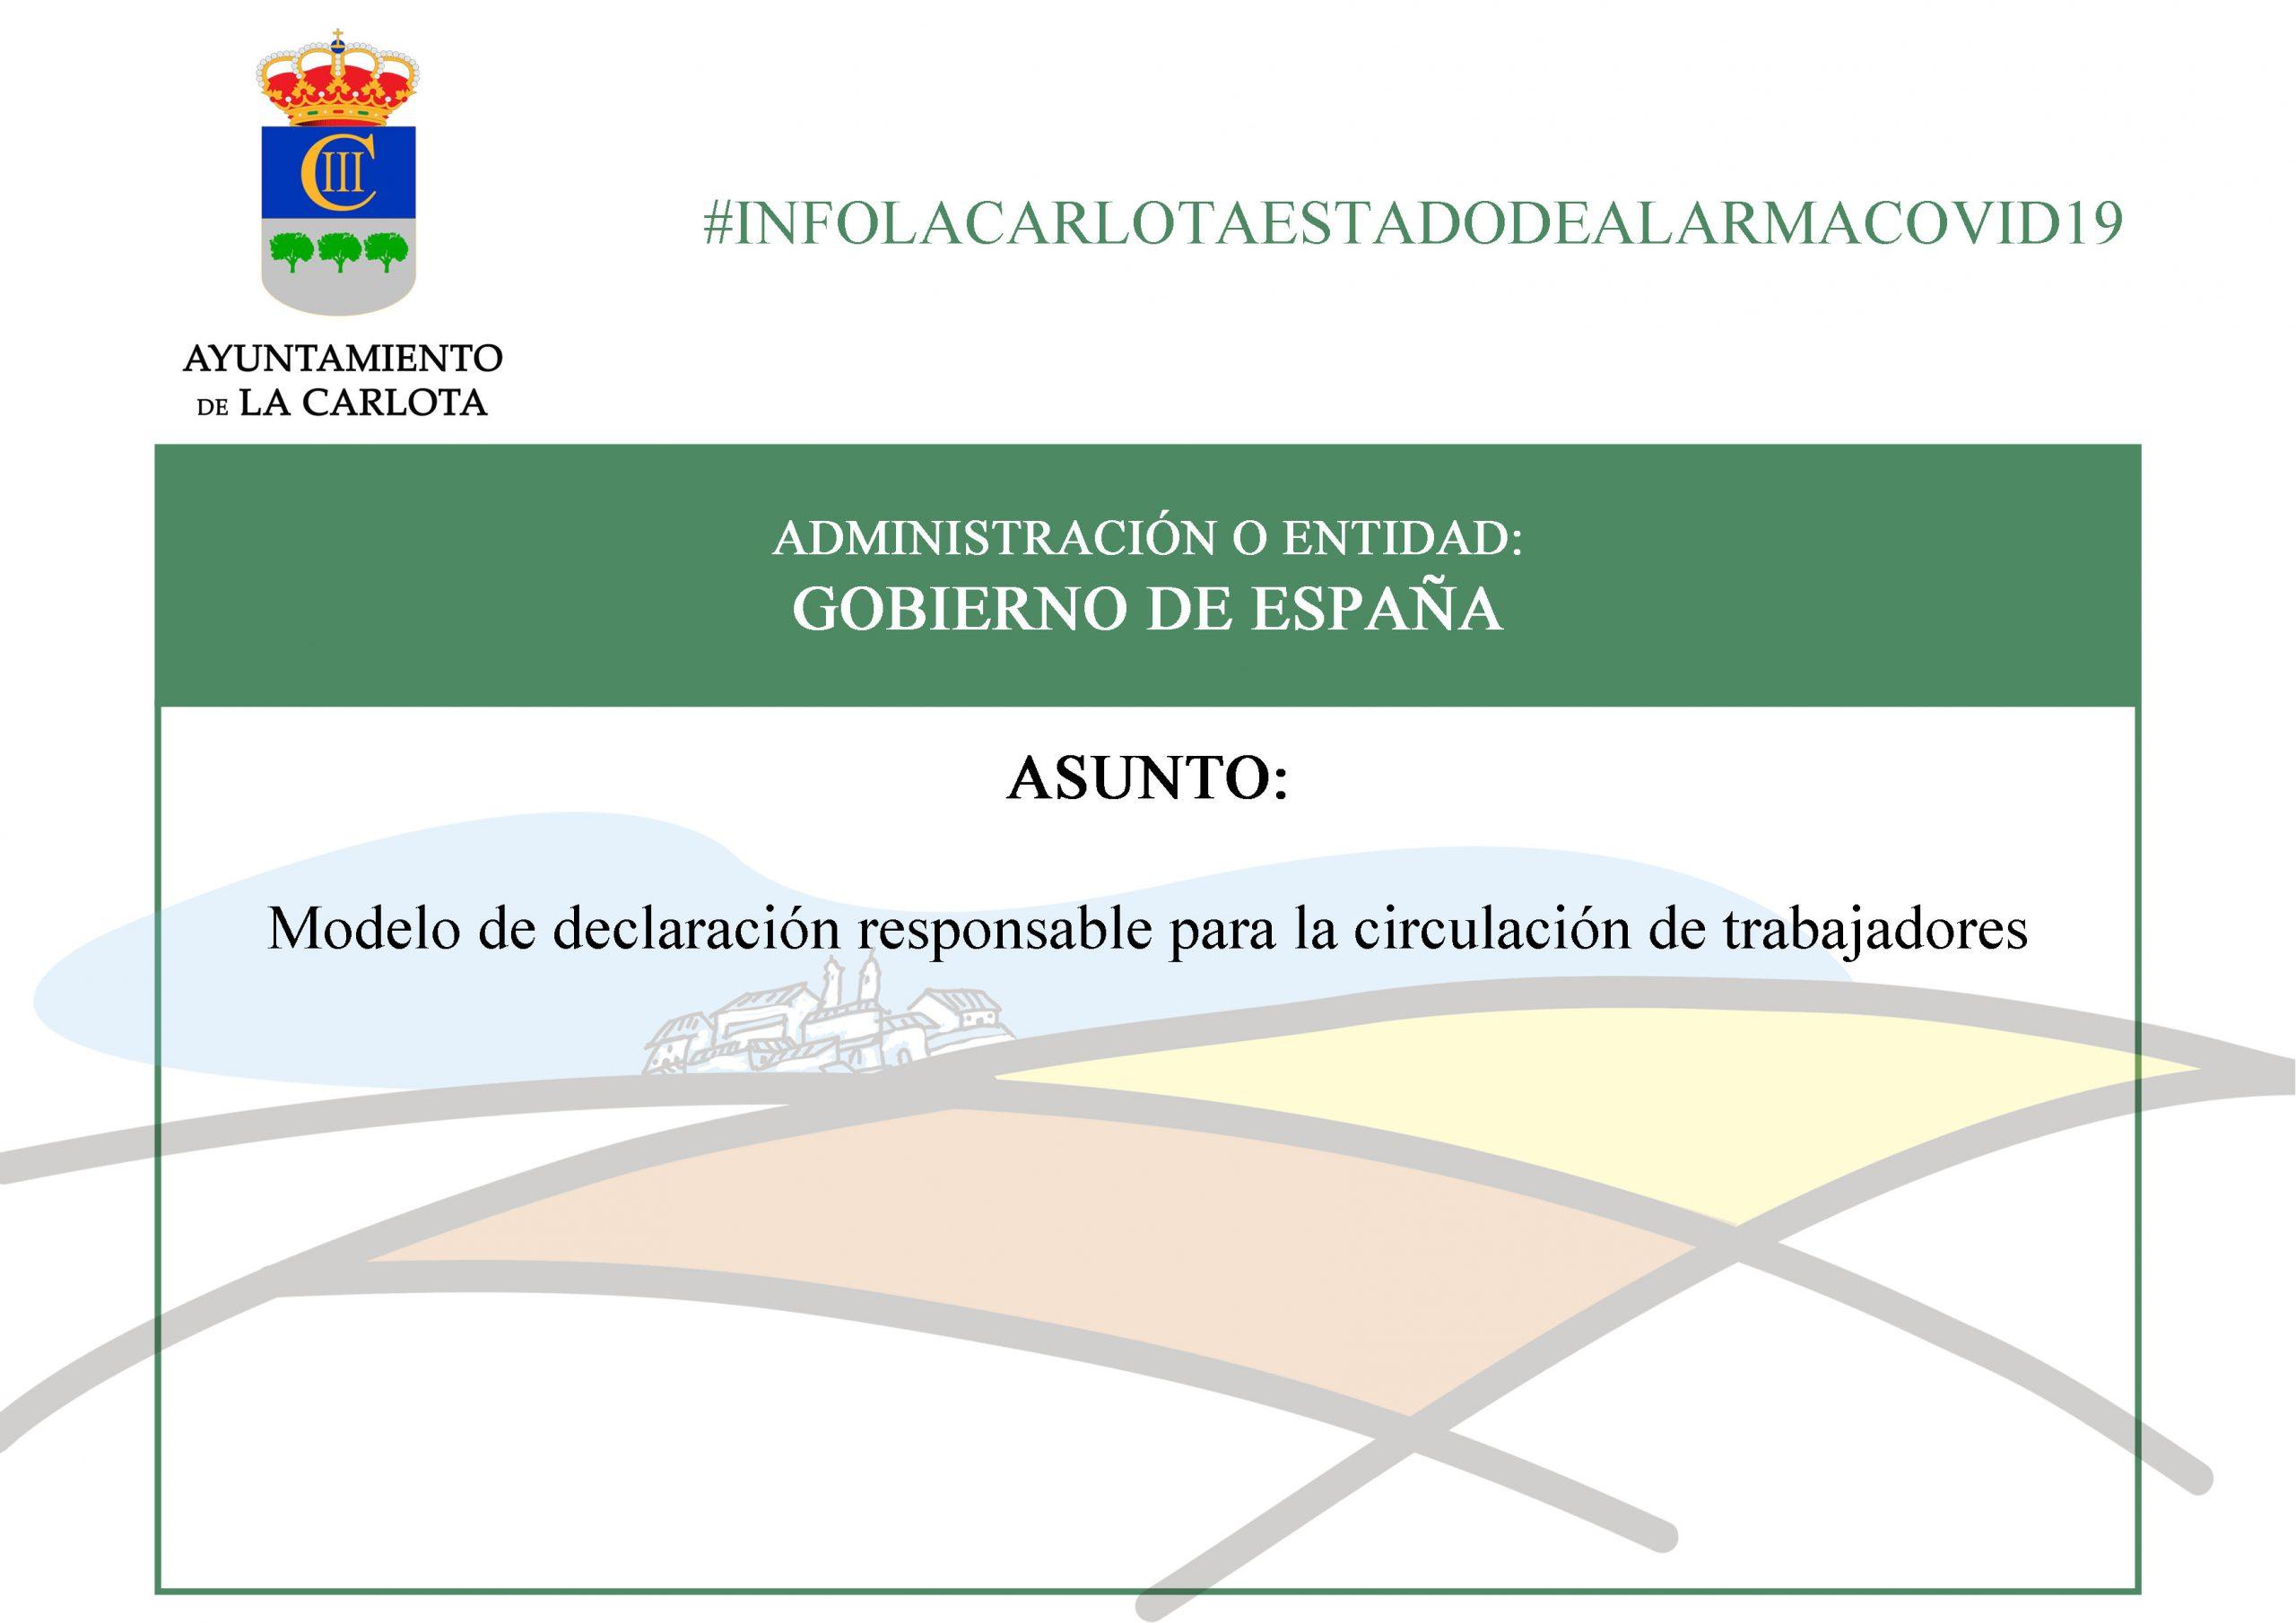 #INFOLACARLOTAESTADODEALARMACOVID19 MODELO DE DECLARACIÓN RESPONSABLE PARA LA CIRCULACIÓN DE TRABAJADORES 1